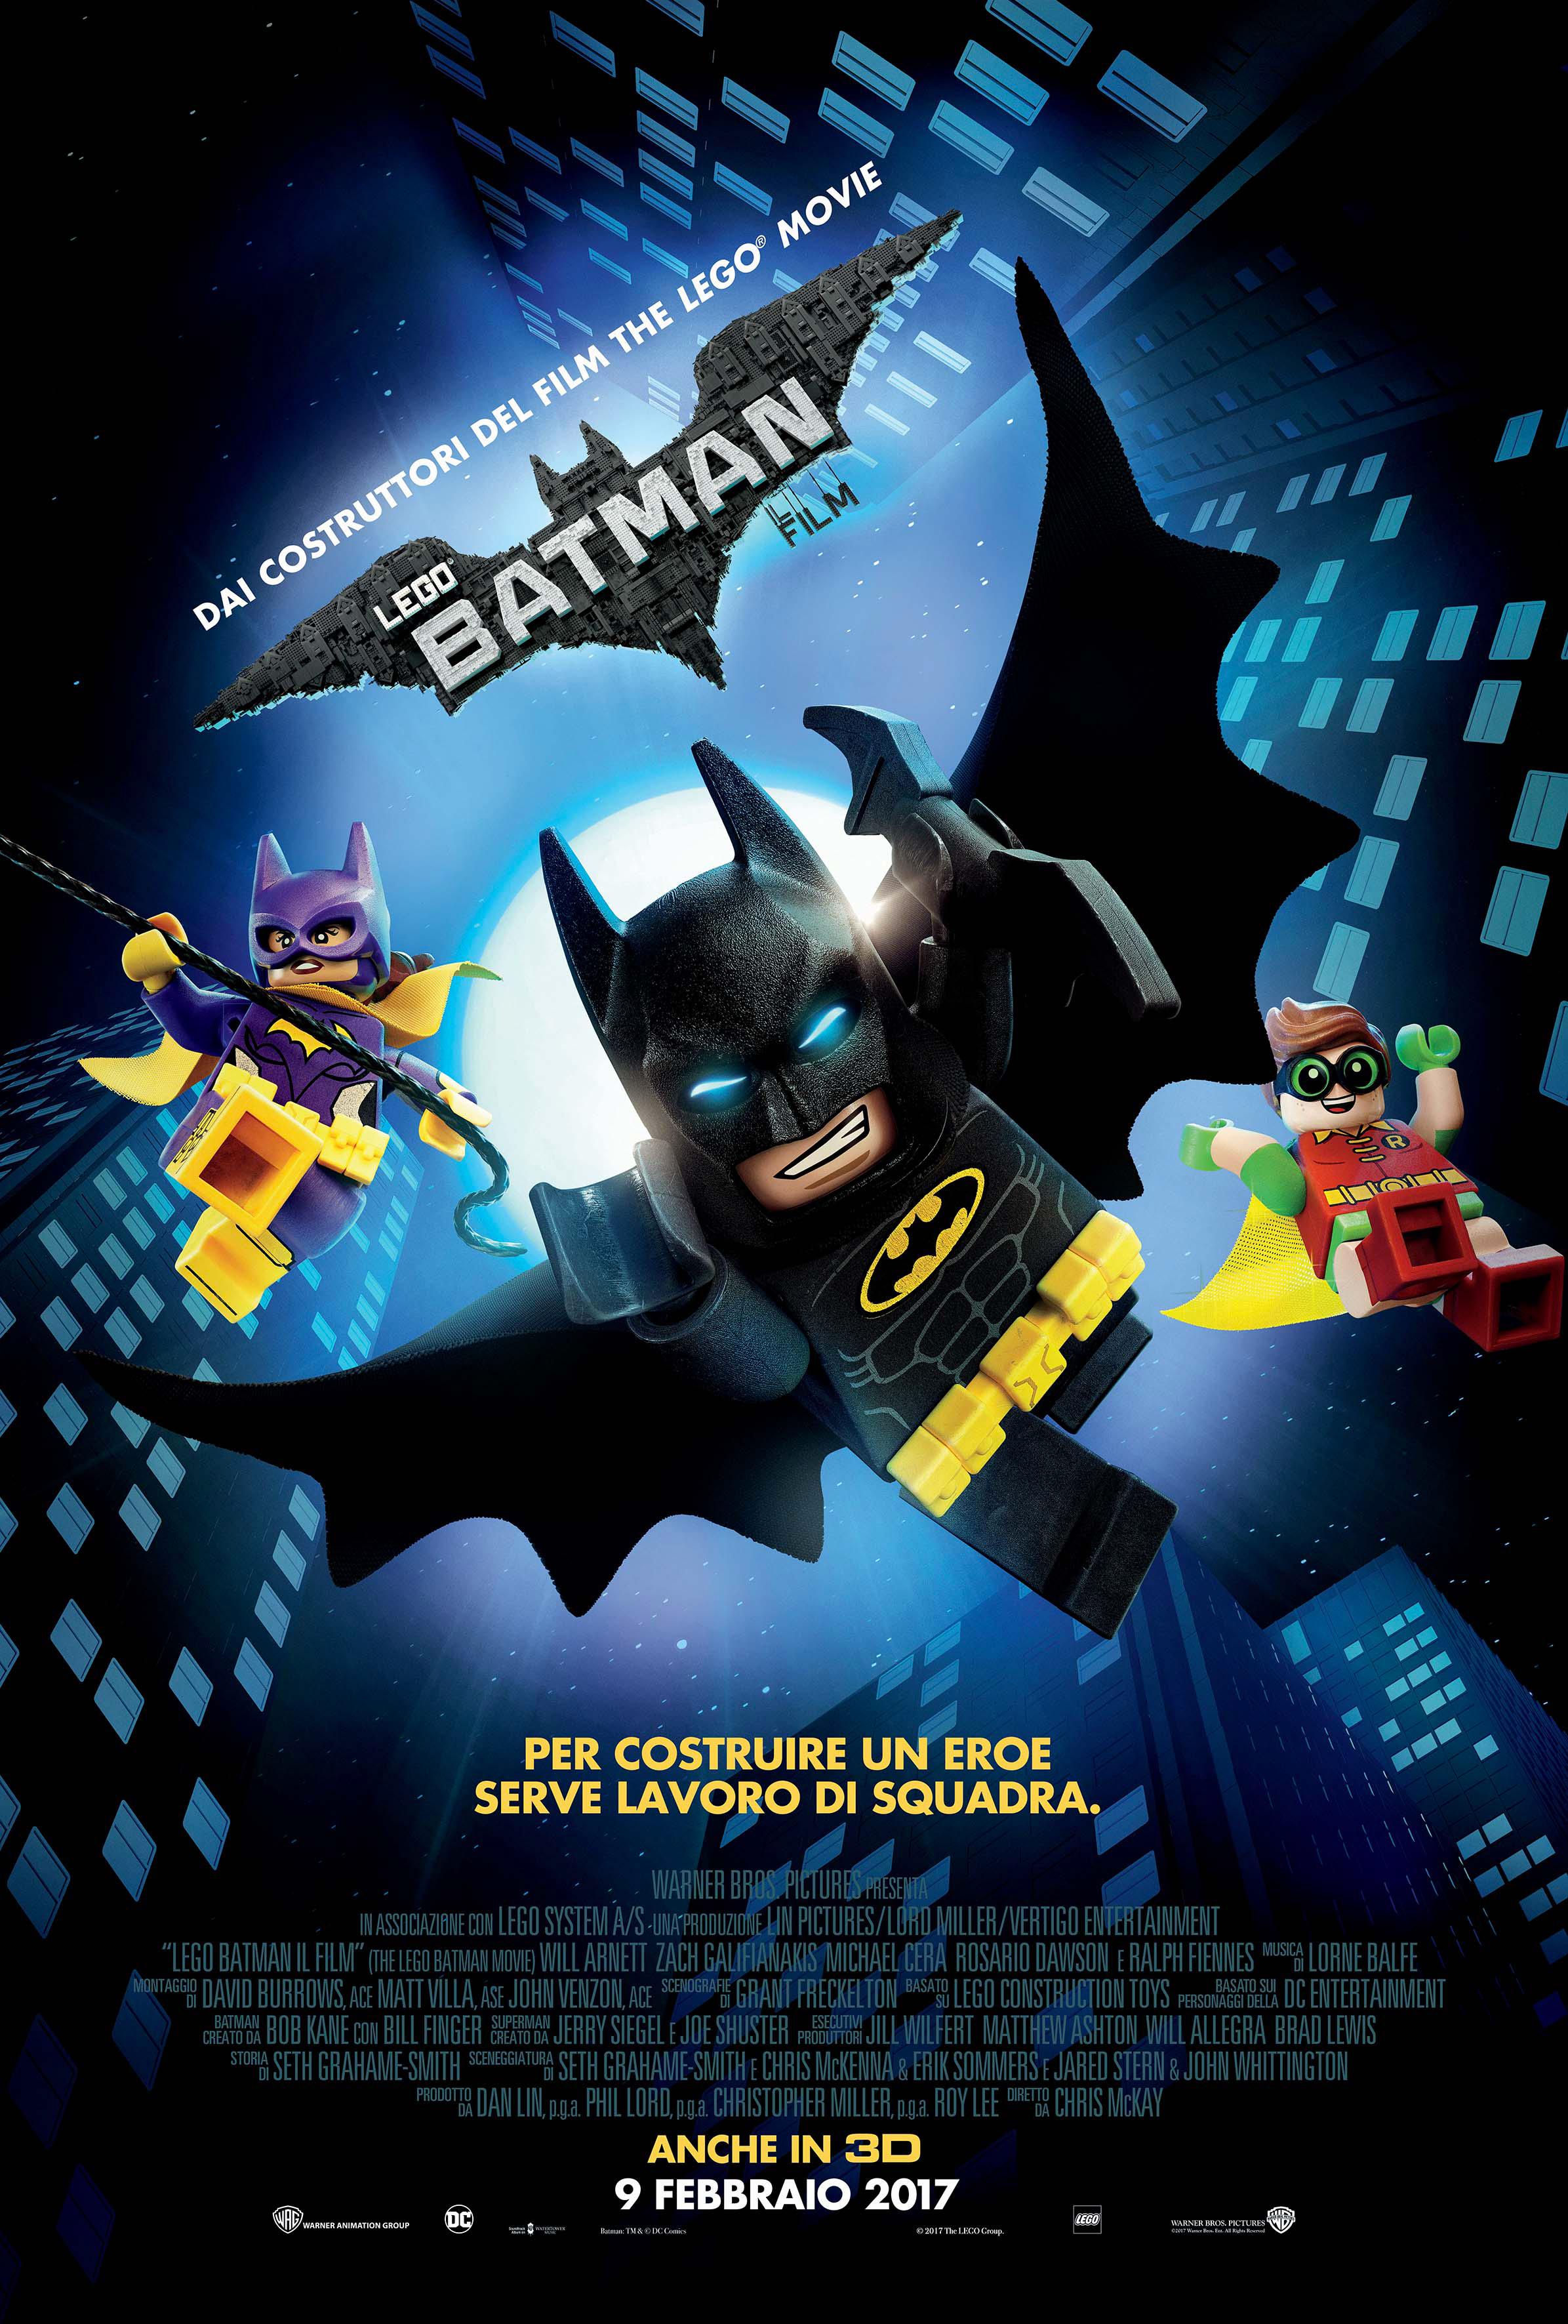 LEGO Batman iI Film